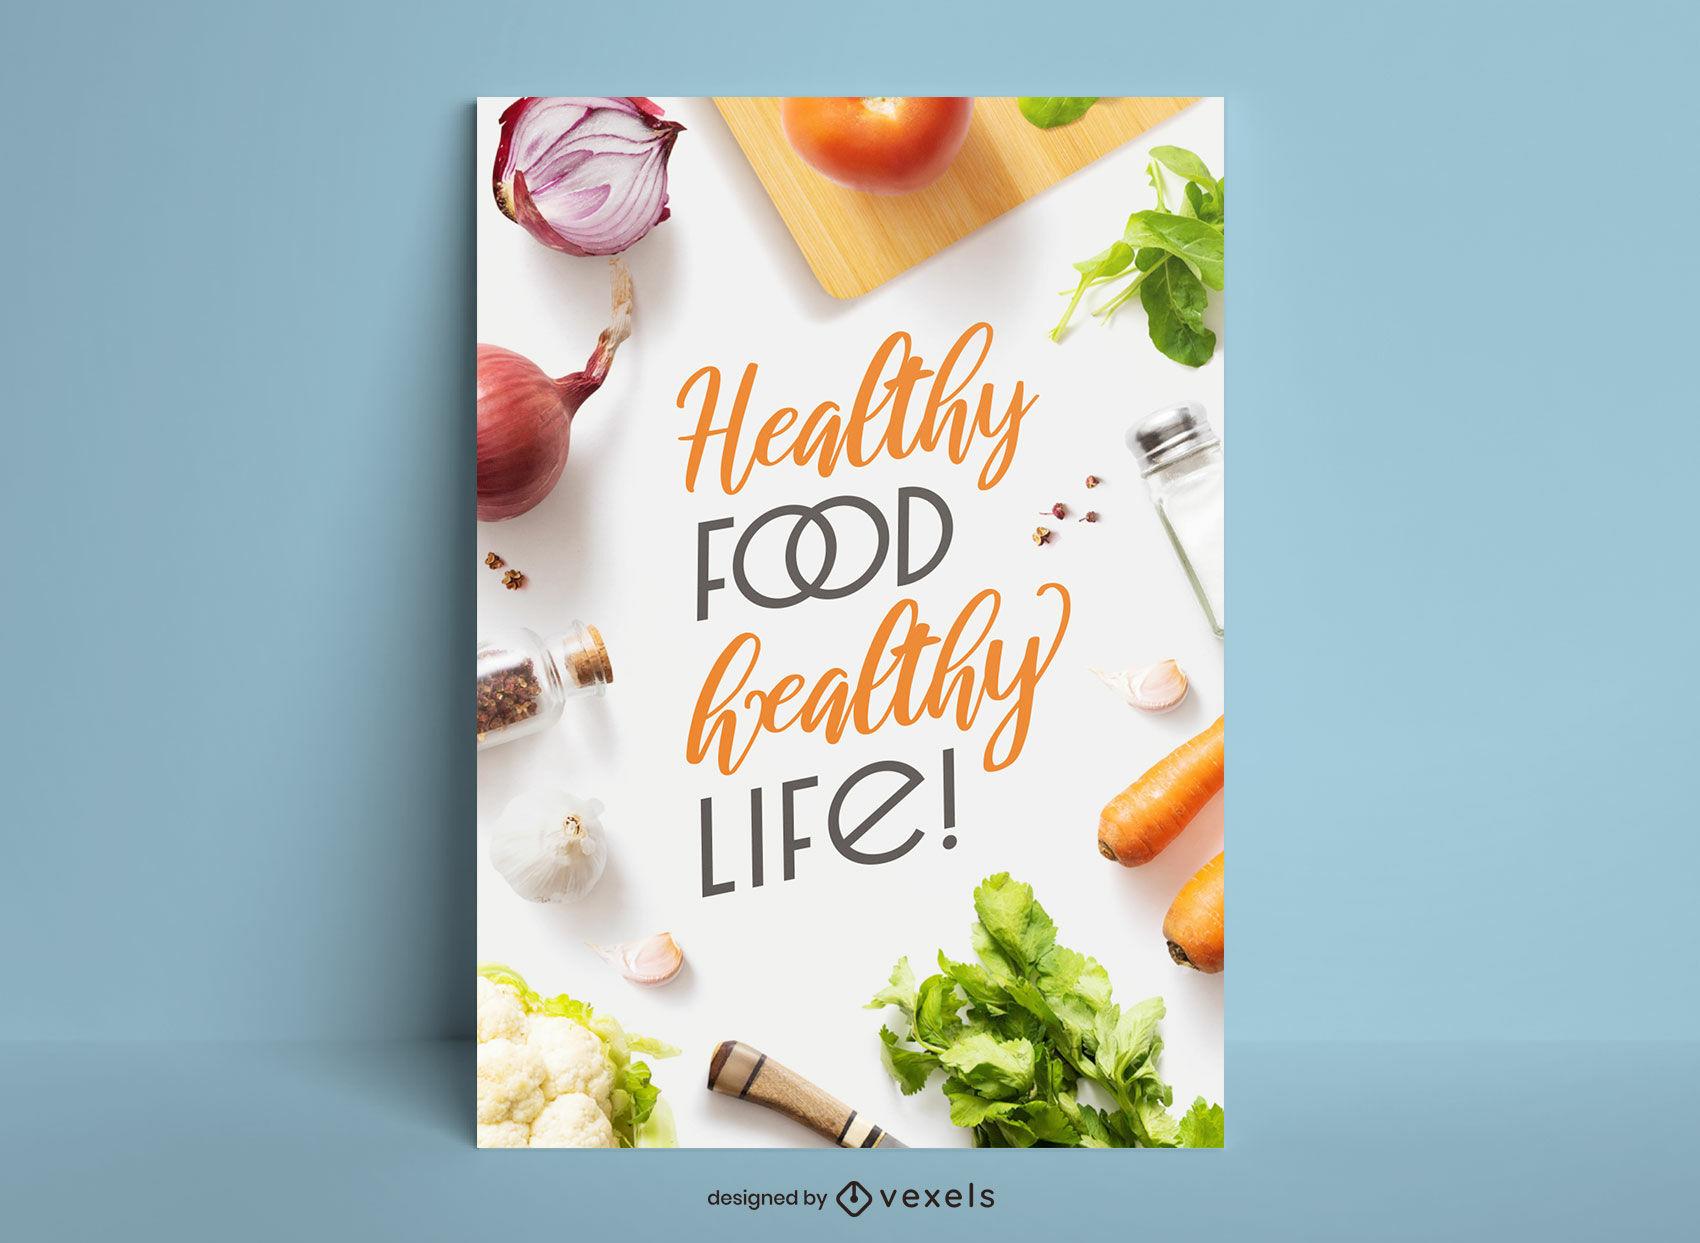 Healthy food ingredients cooking poster design